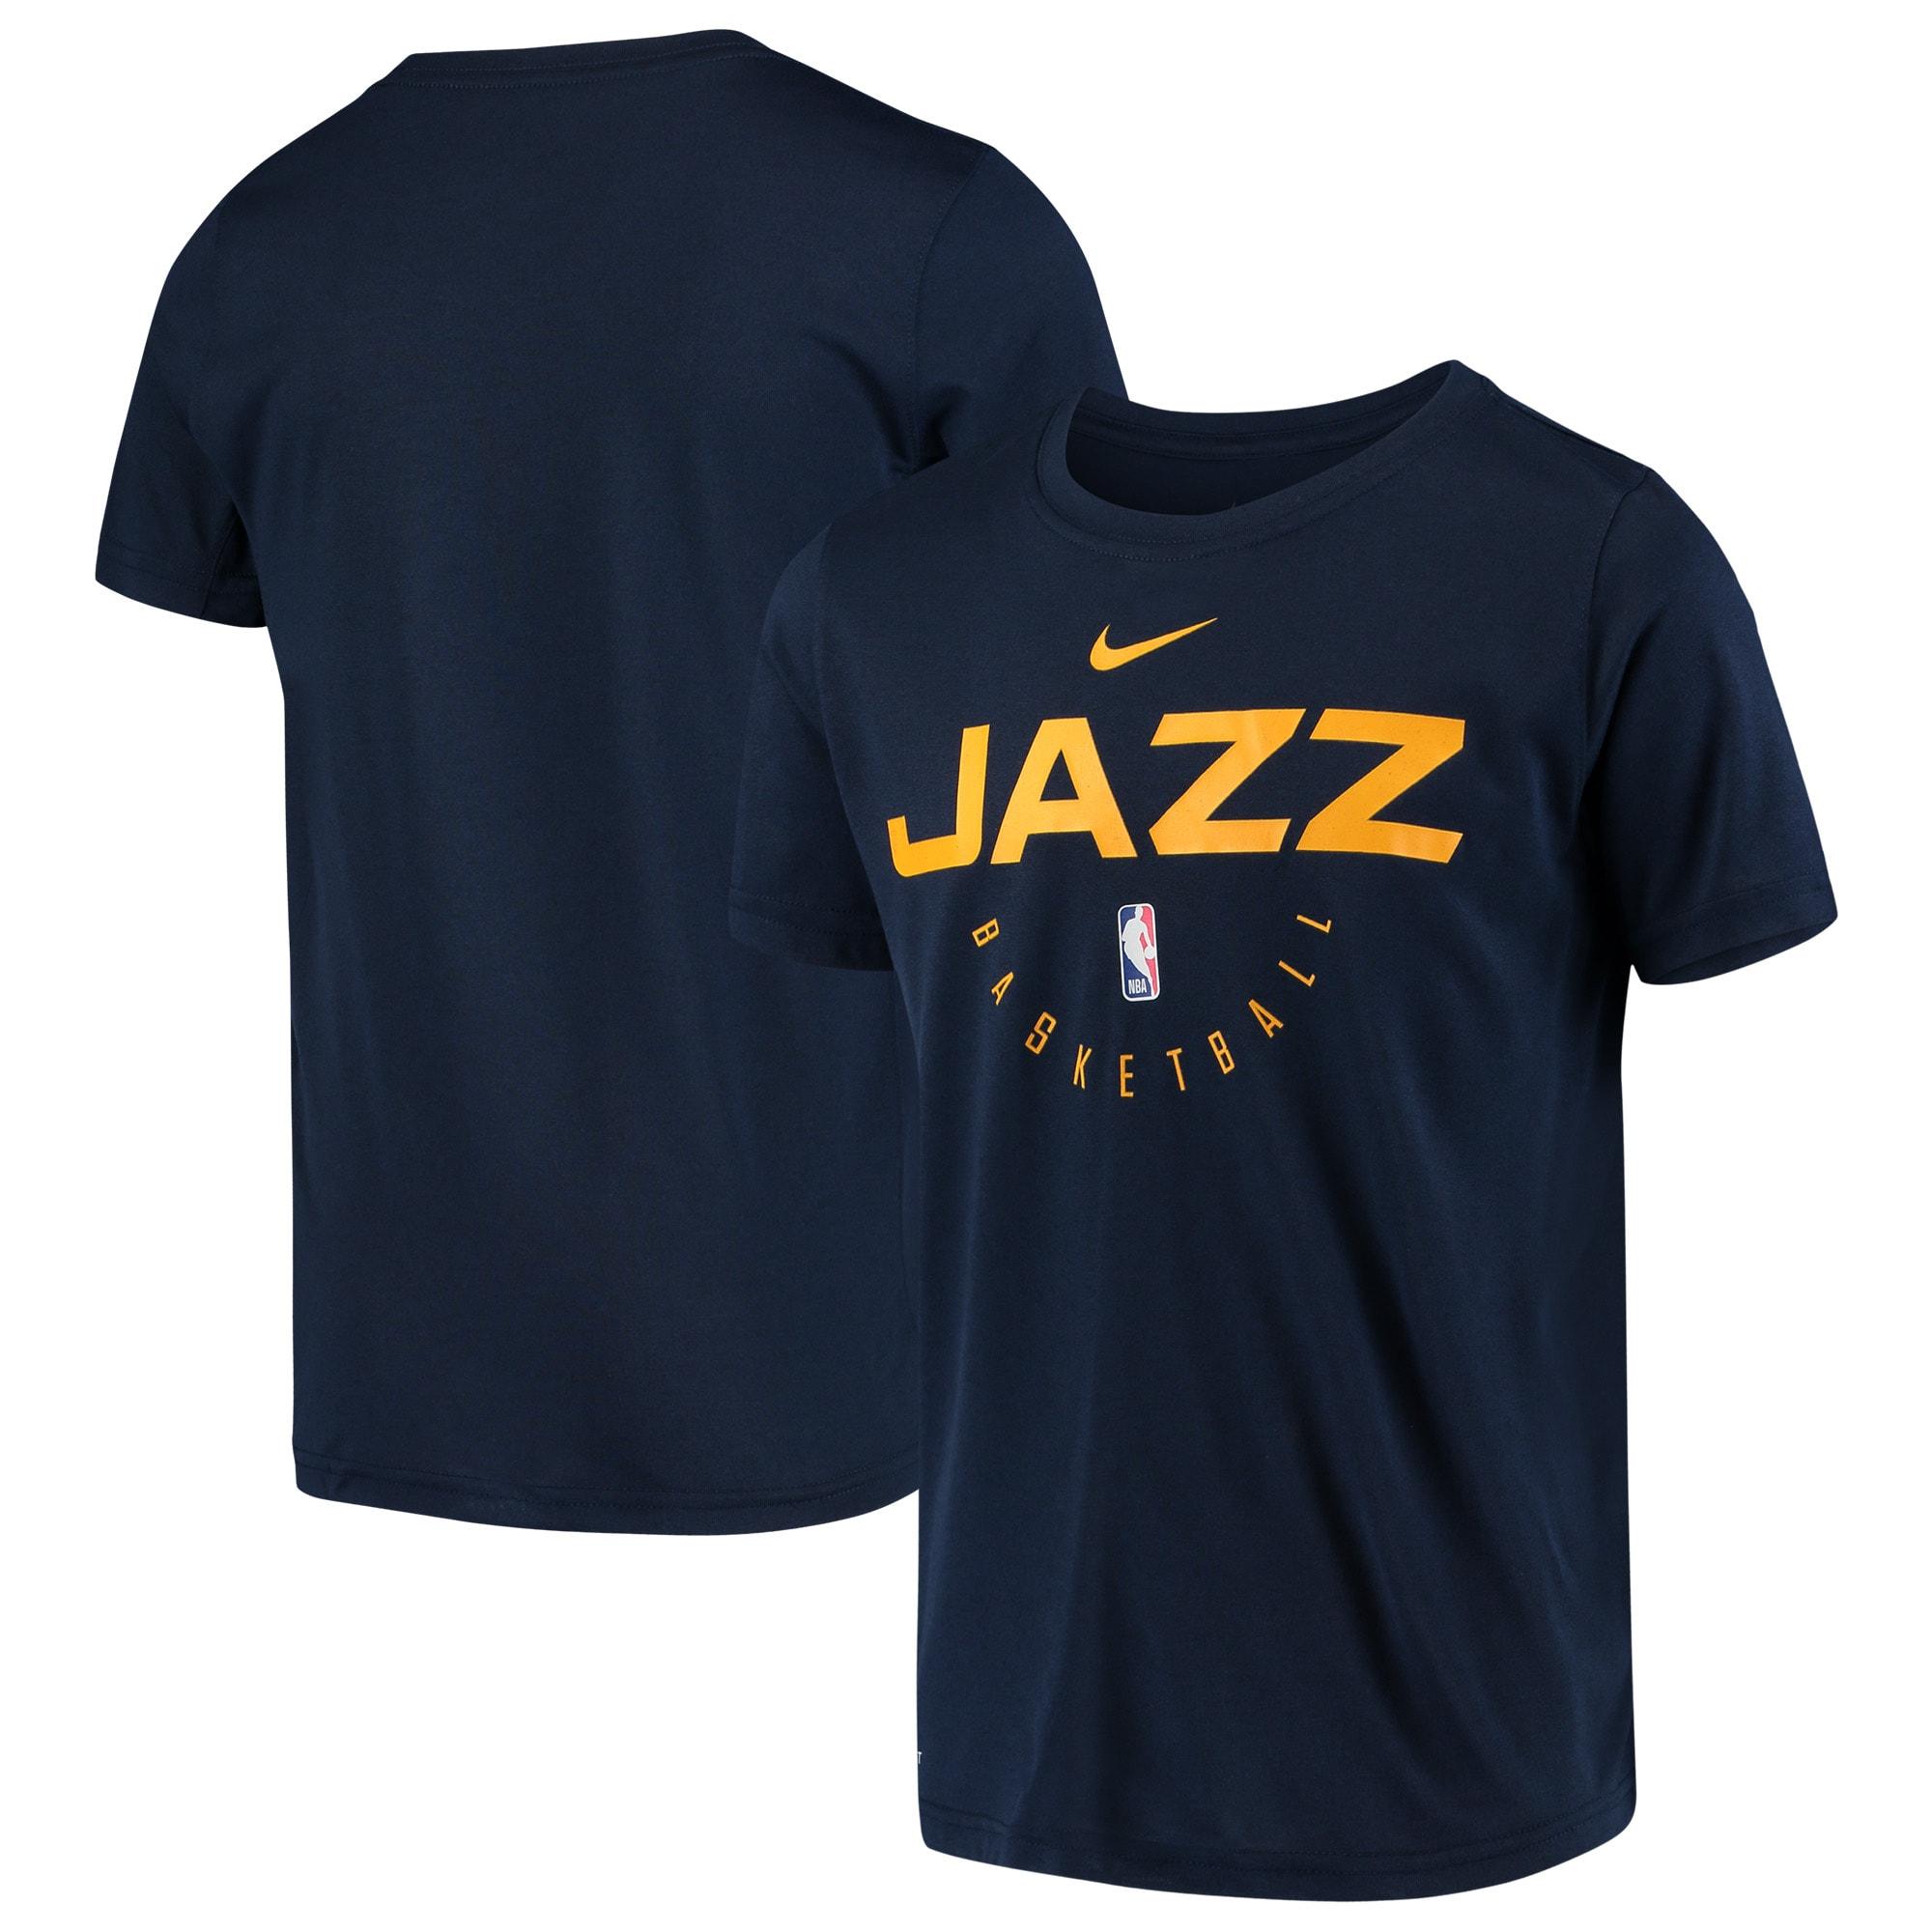 Utah Jazz Nike Youth Practice Logo Legend Performance T-Shirt - Navy